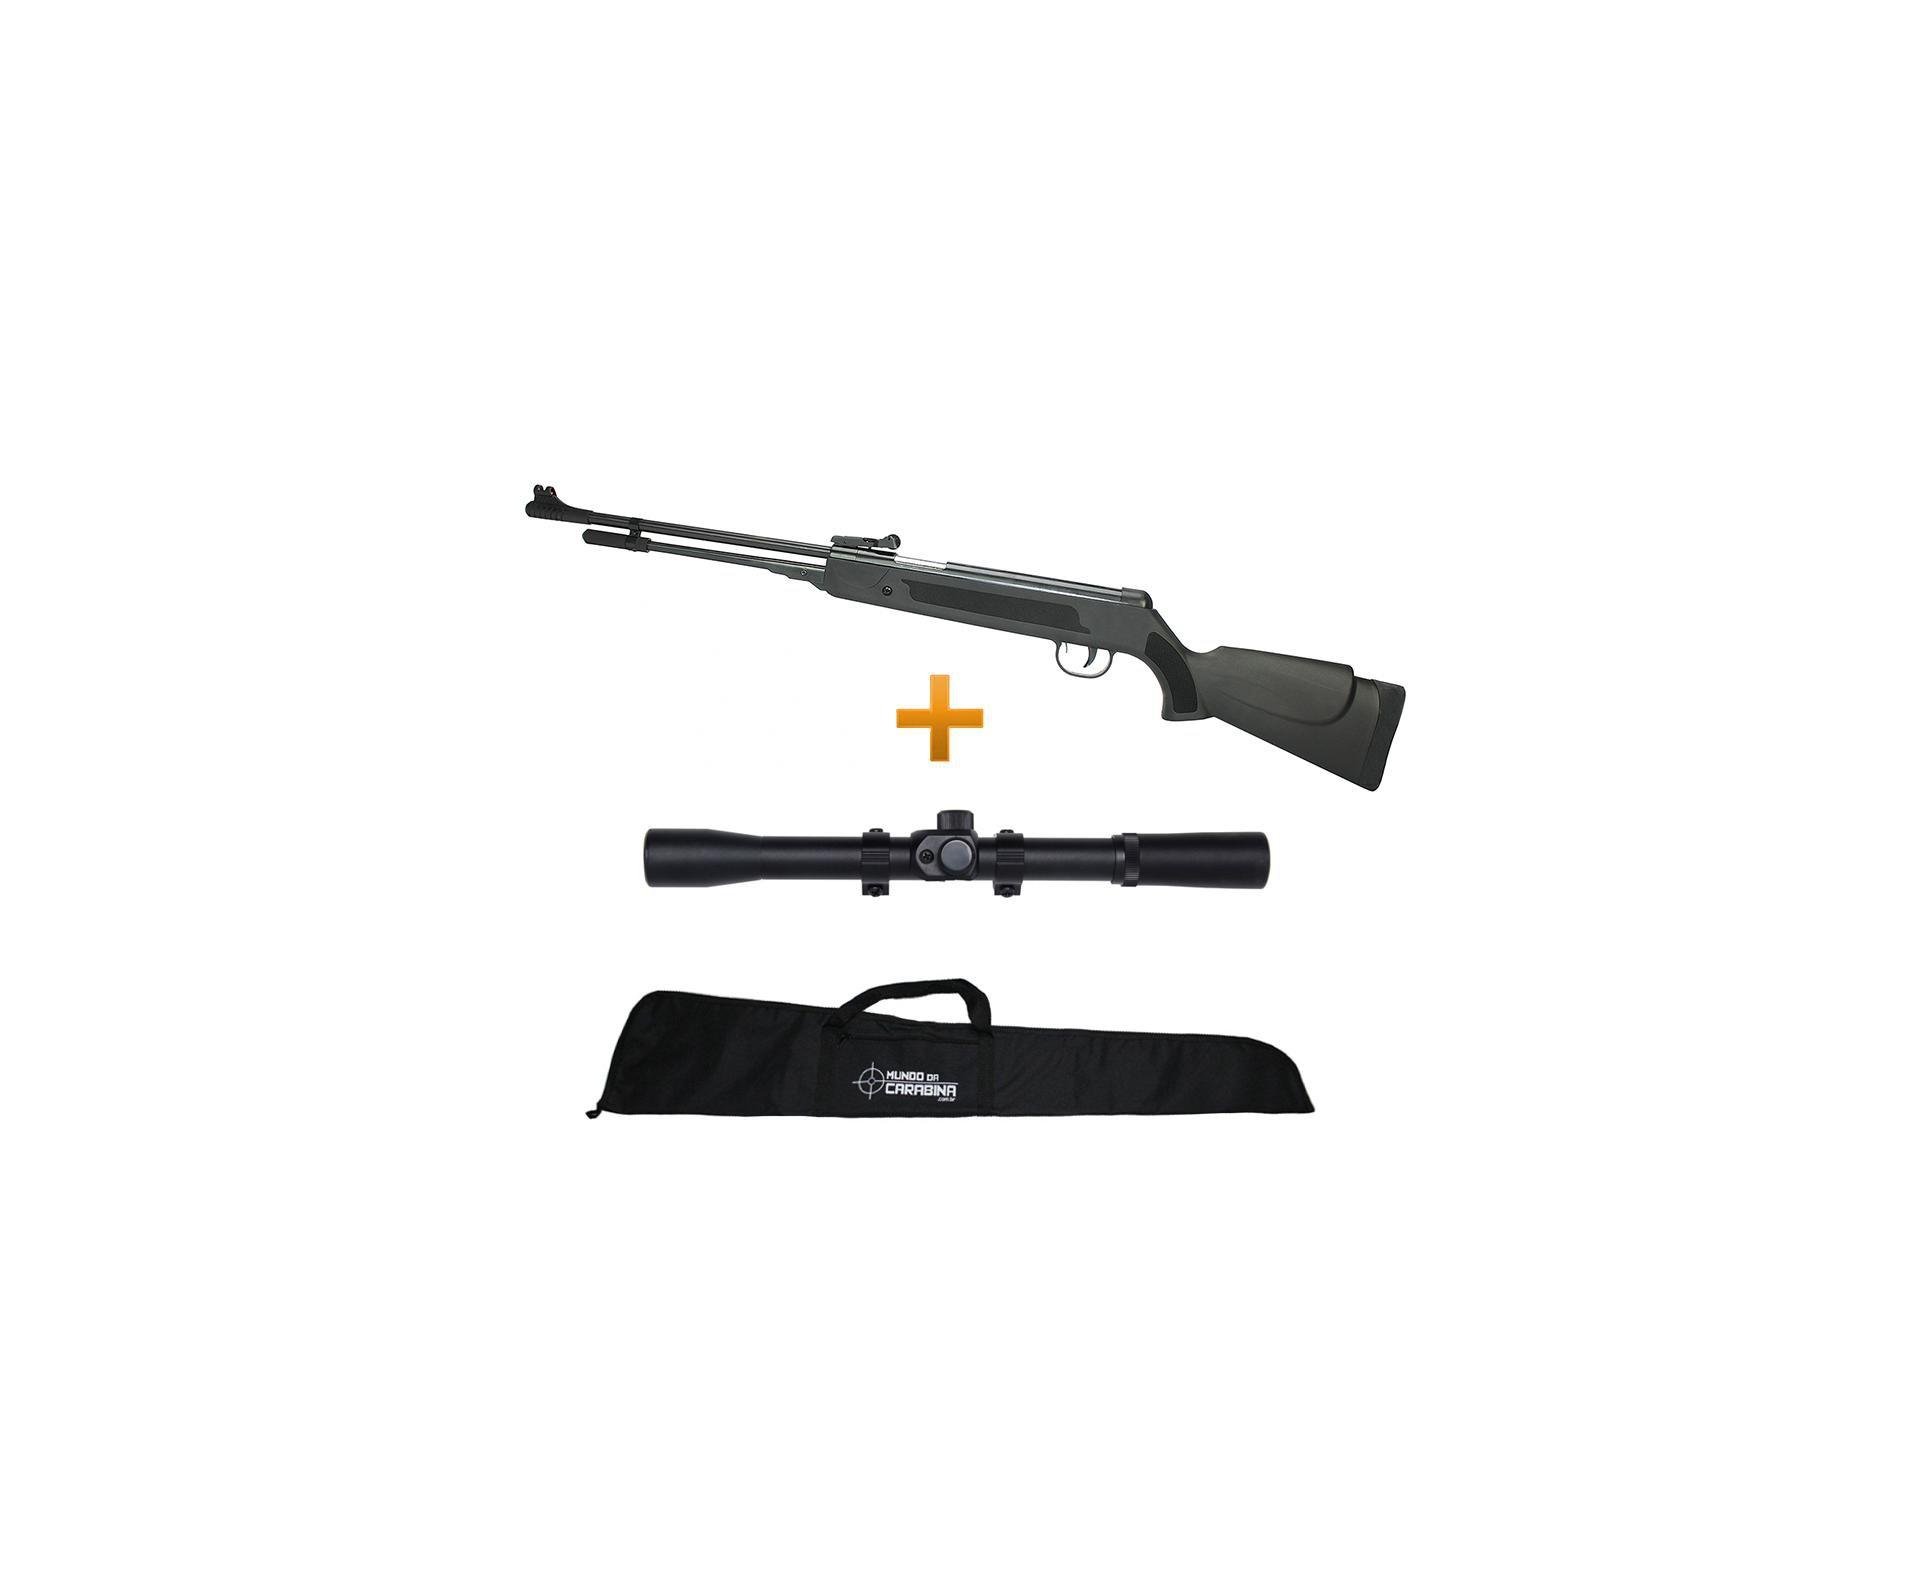 Carabina De Pressão Spring Black Cal 5,5mm + Capa + Luneta 4x20 - Fixxar